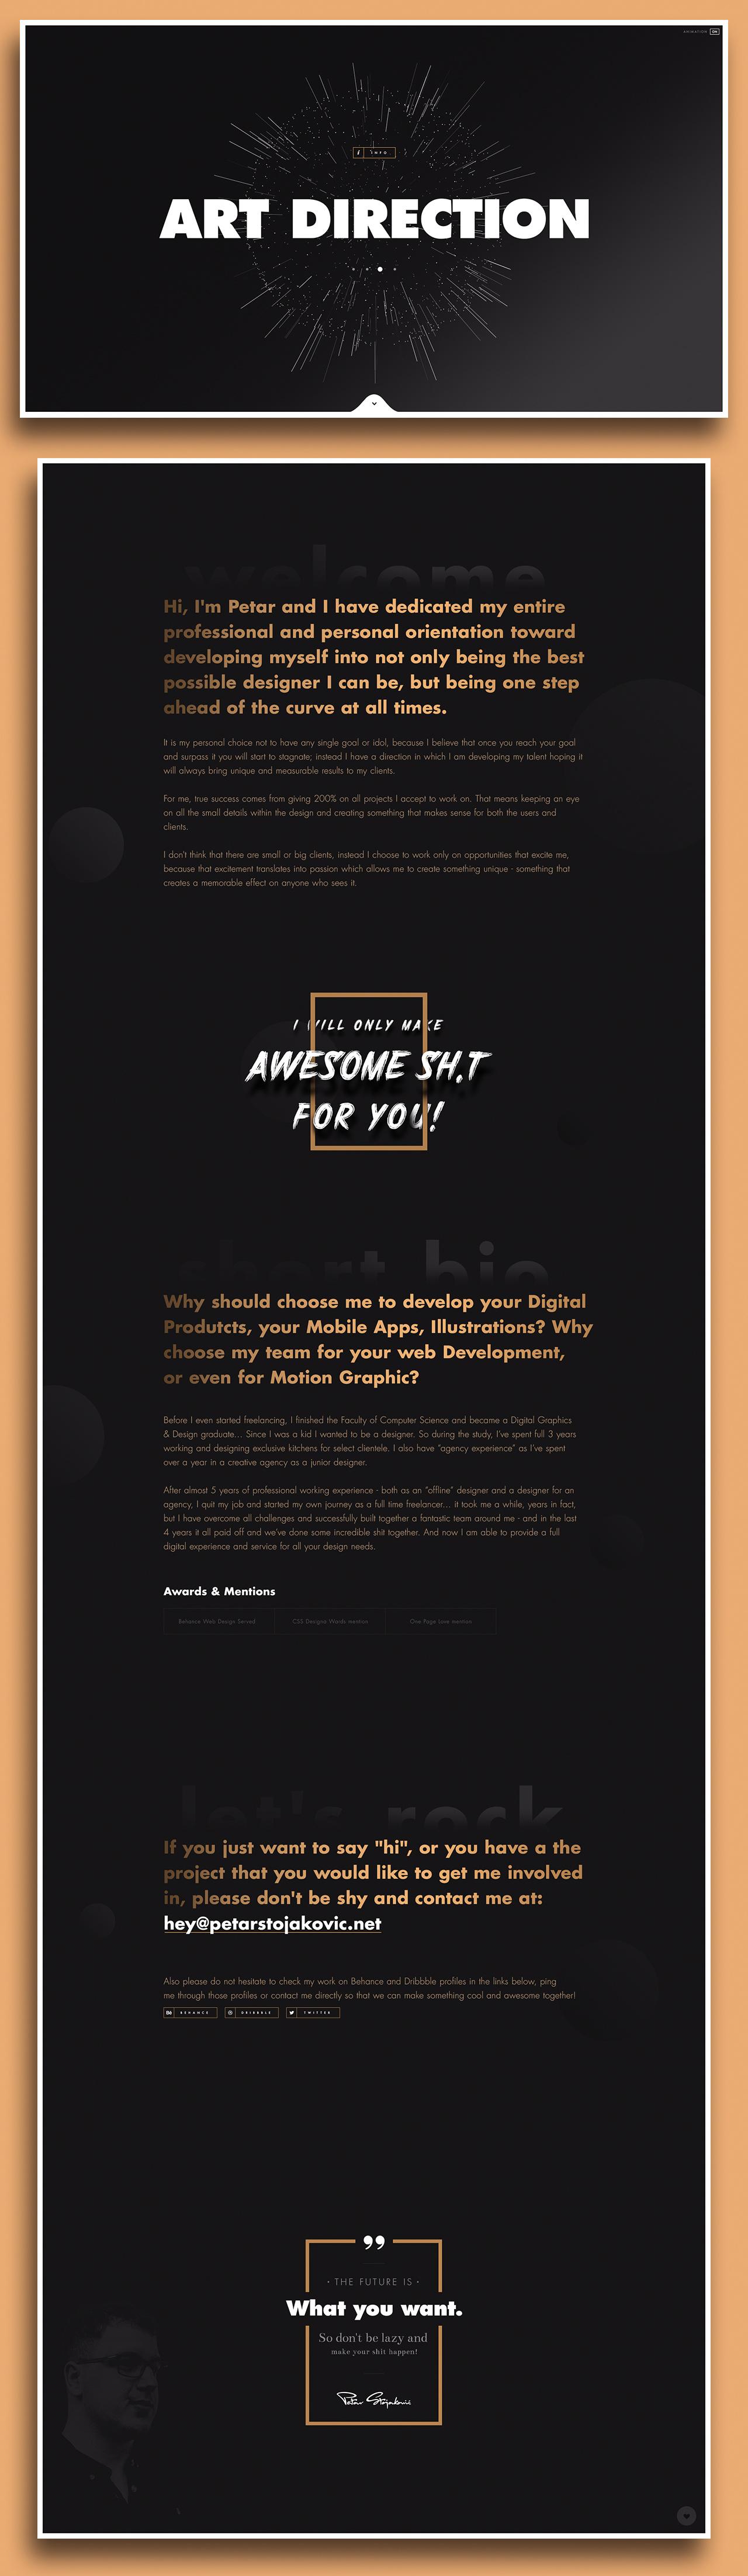 Petar Stojakovic Web Design Design One Page Website